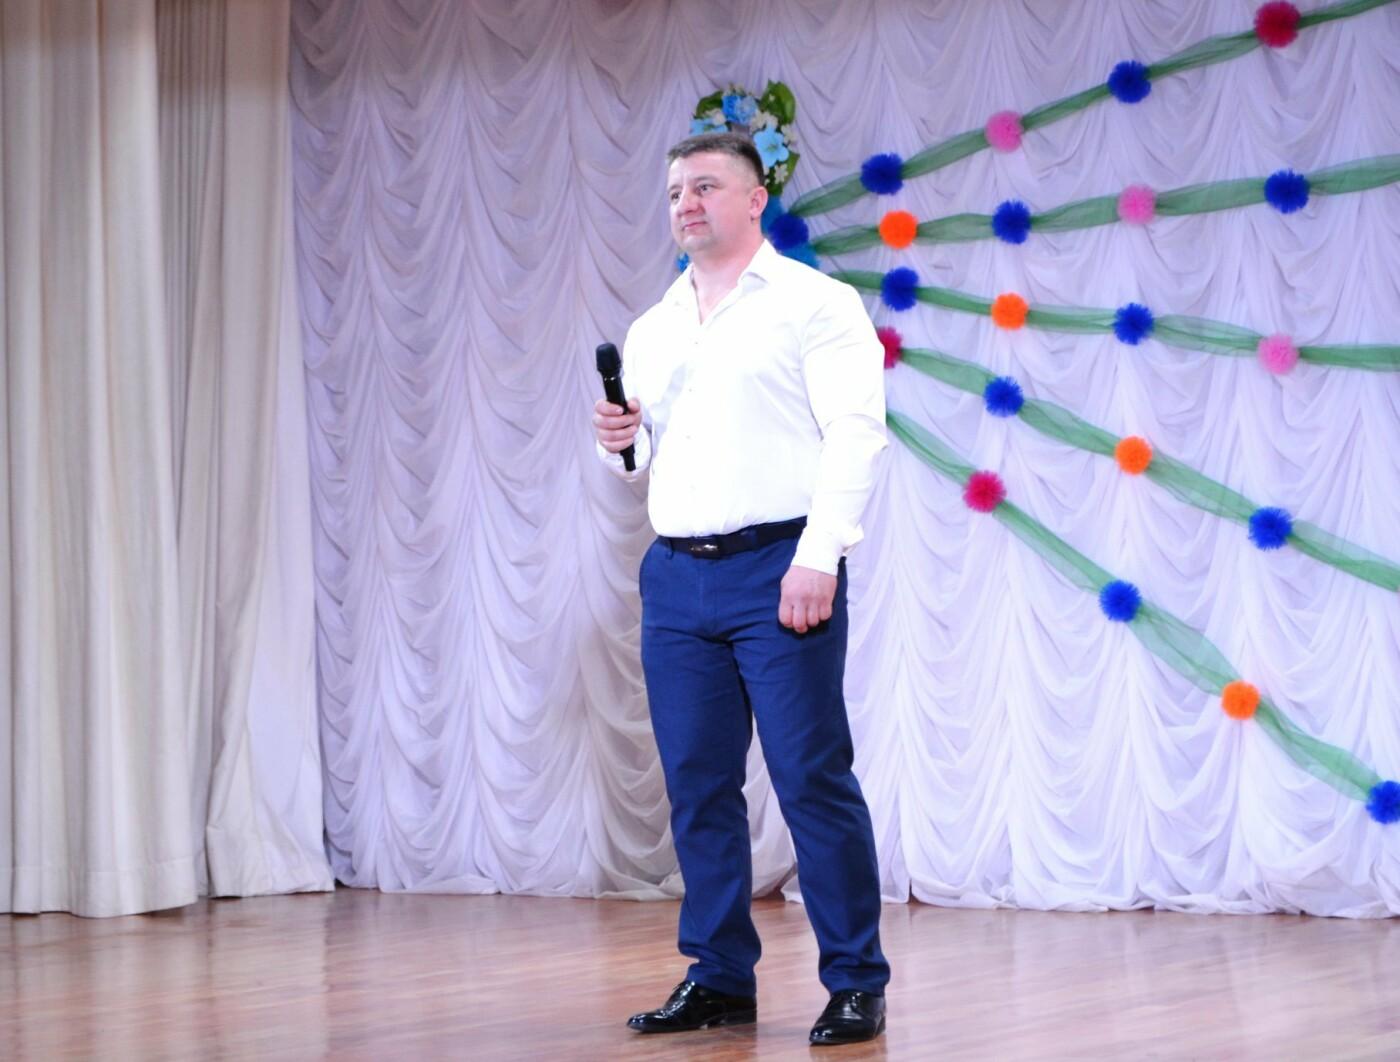 В селе Малодолинское поздравили женщин с 8 Марта, фото-12